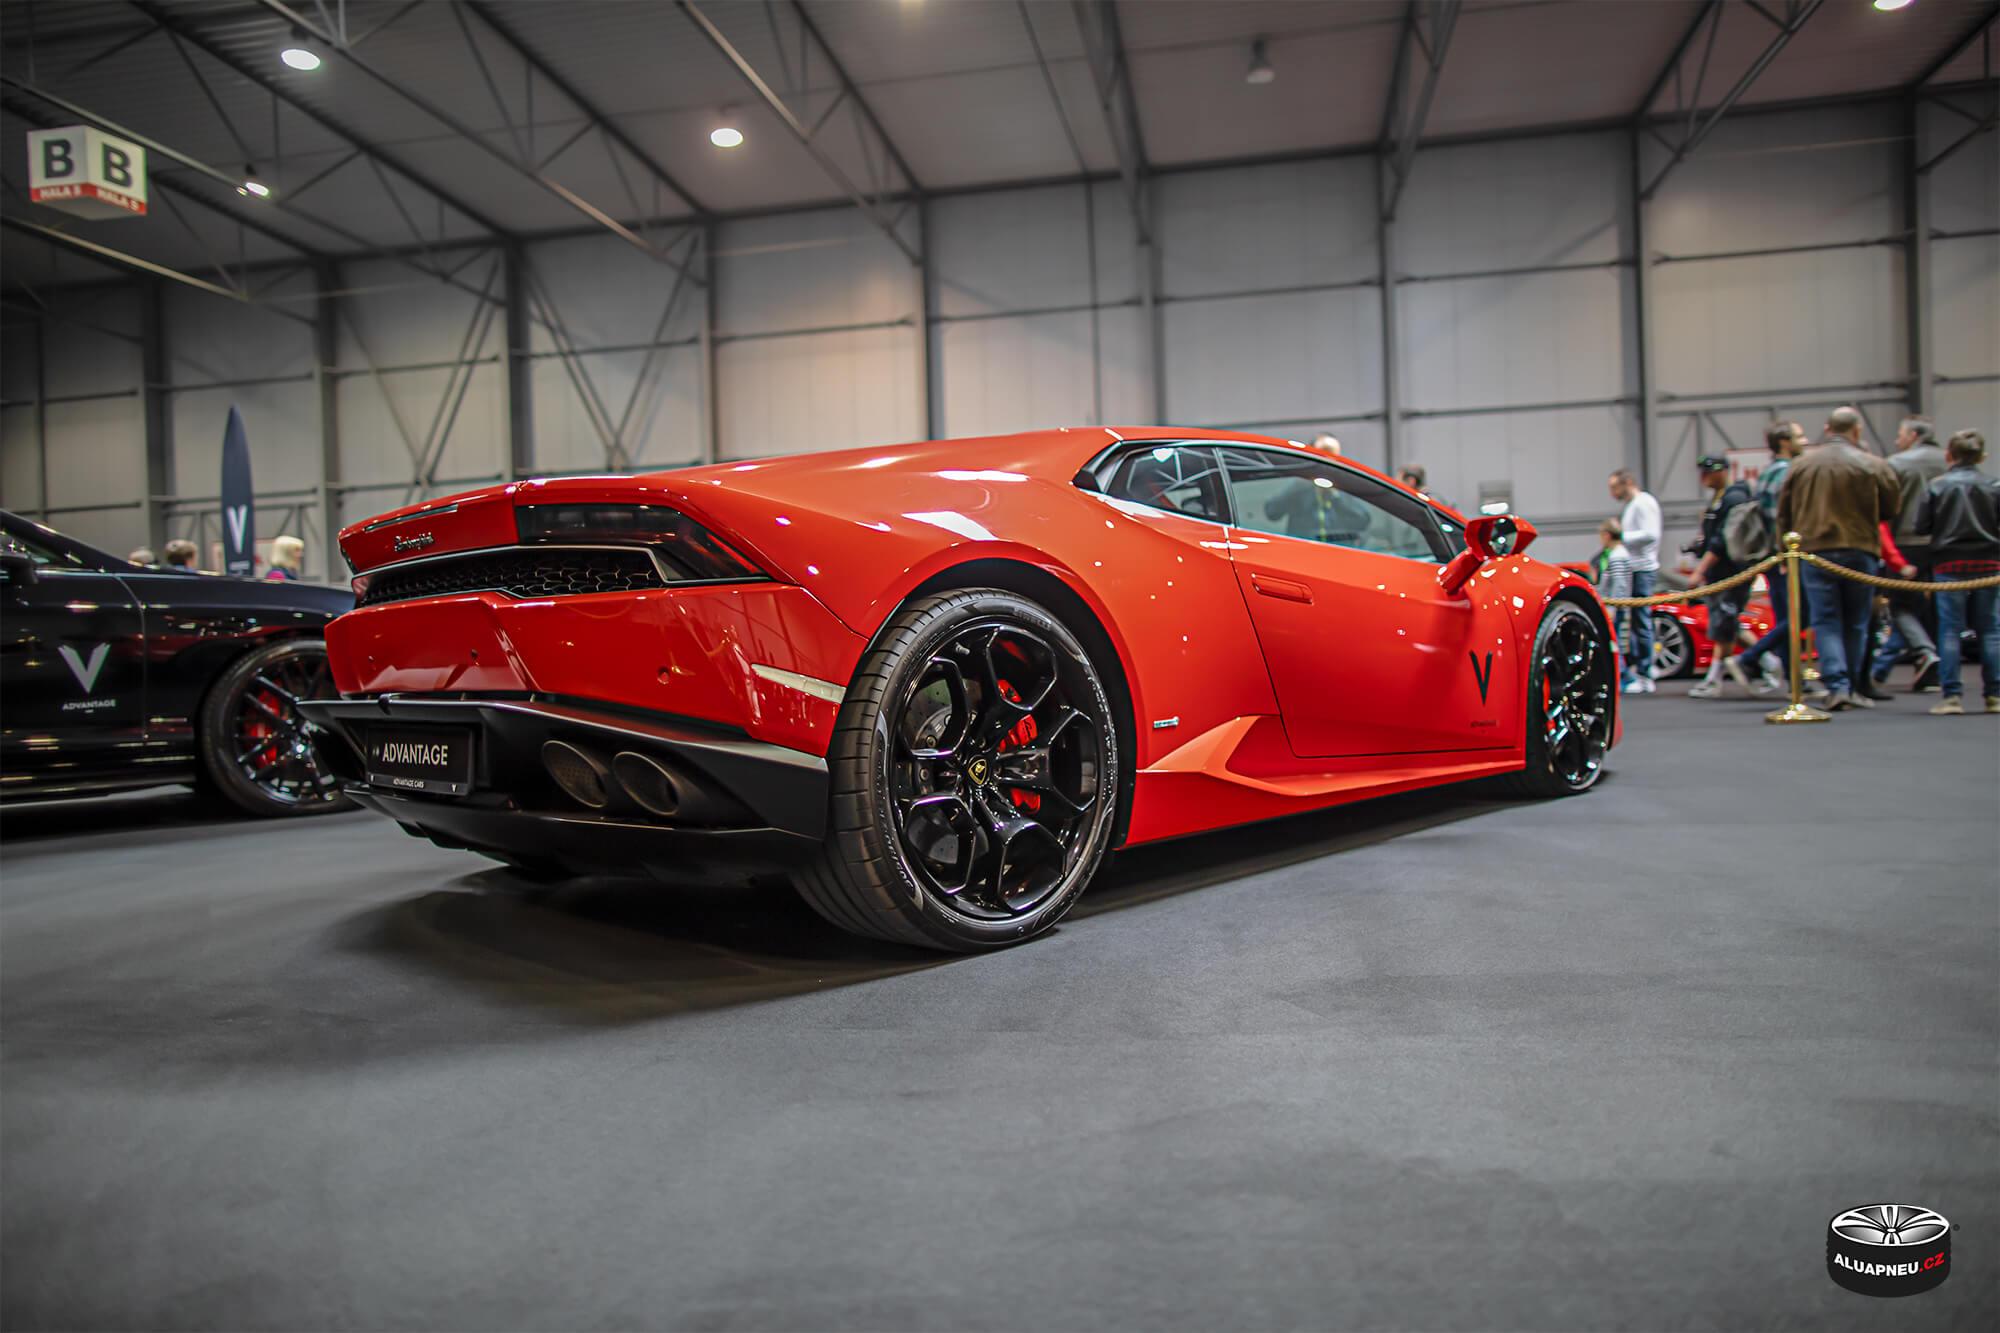 Černá alu kola Lamborghini - Autosalon Praha 2019 - www.aluapneu.cz